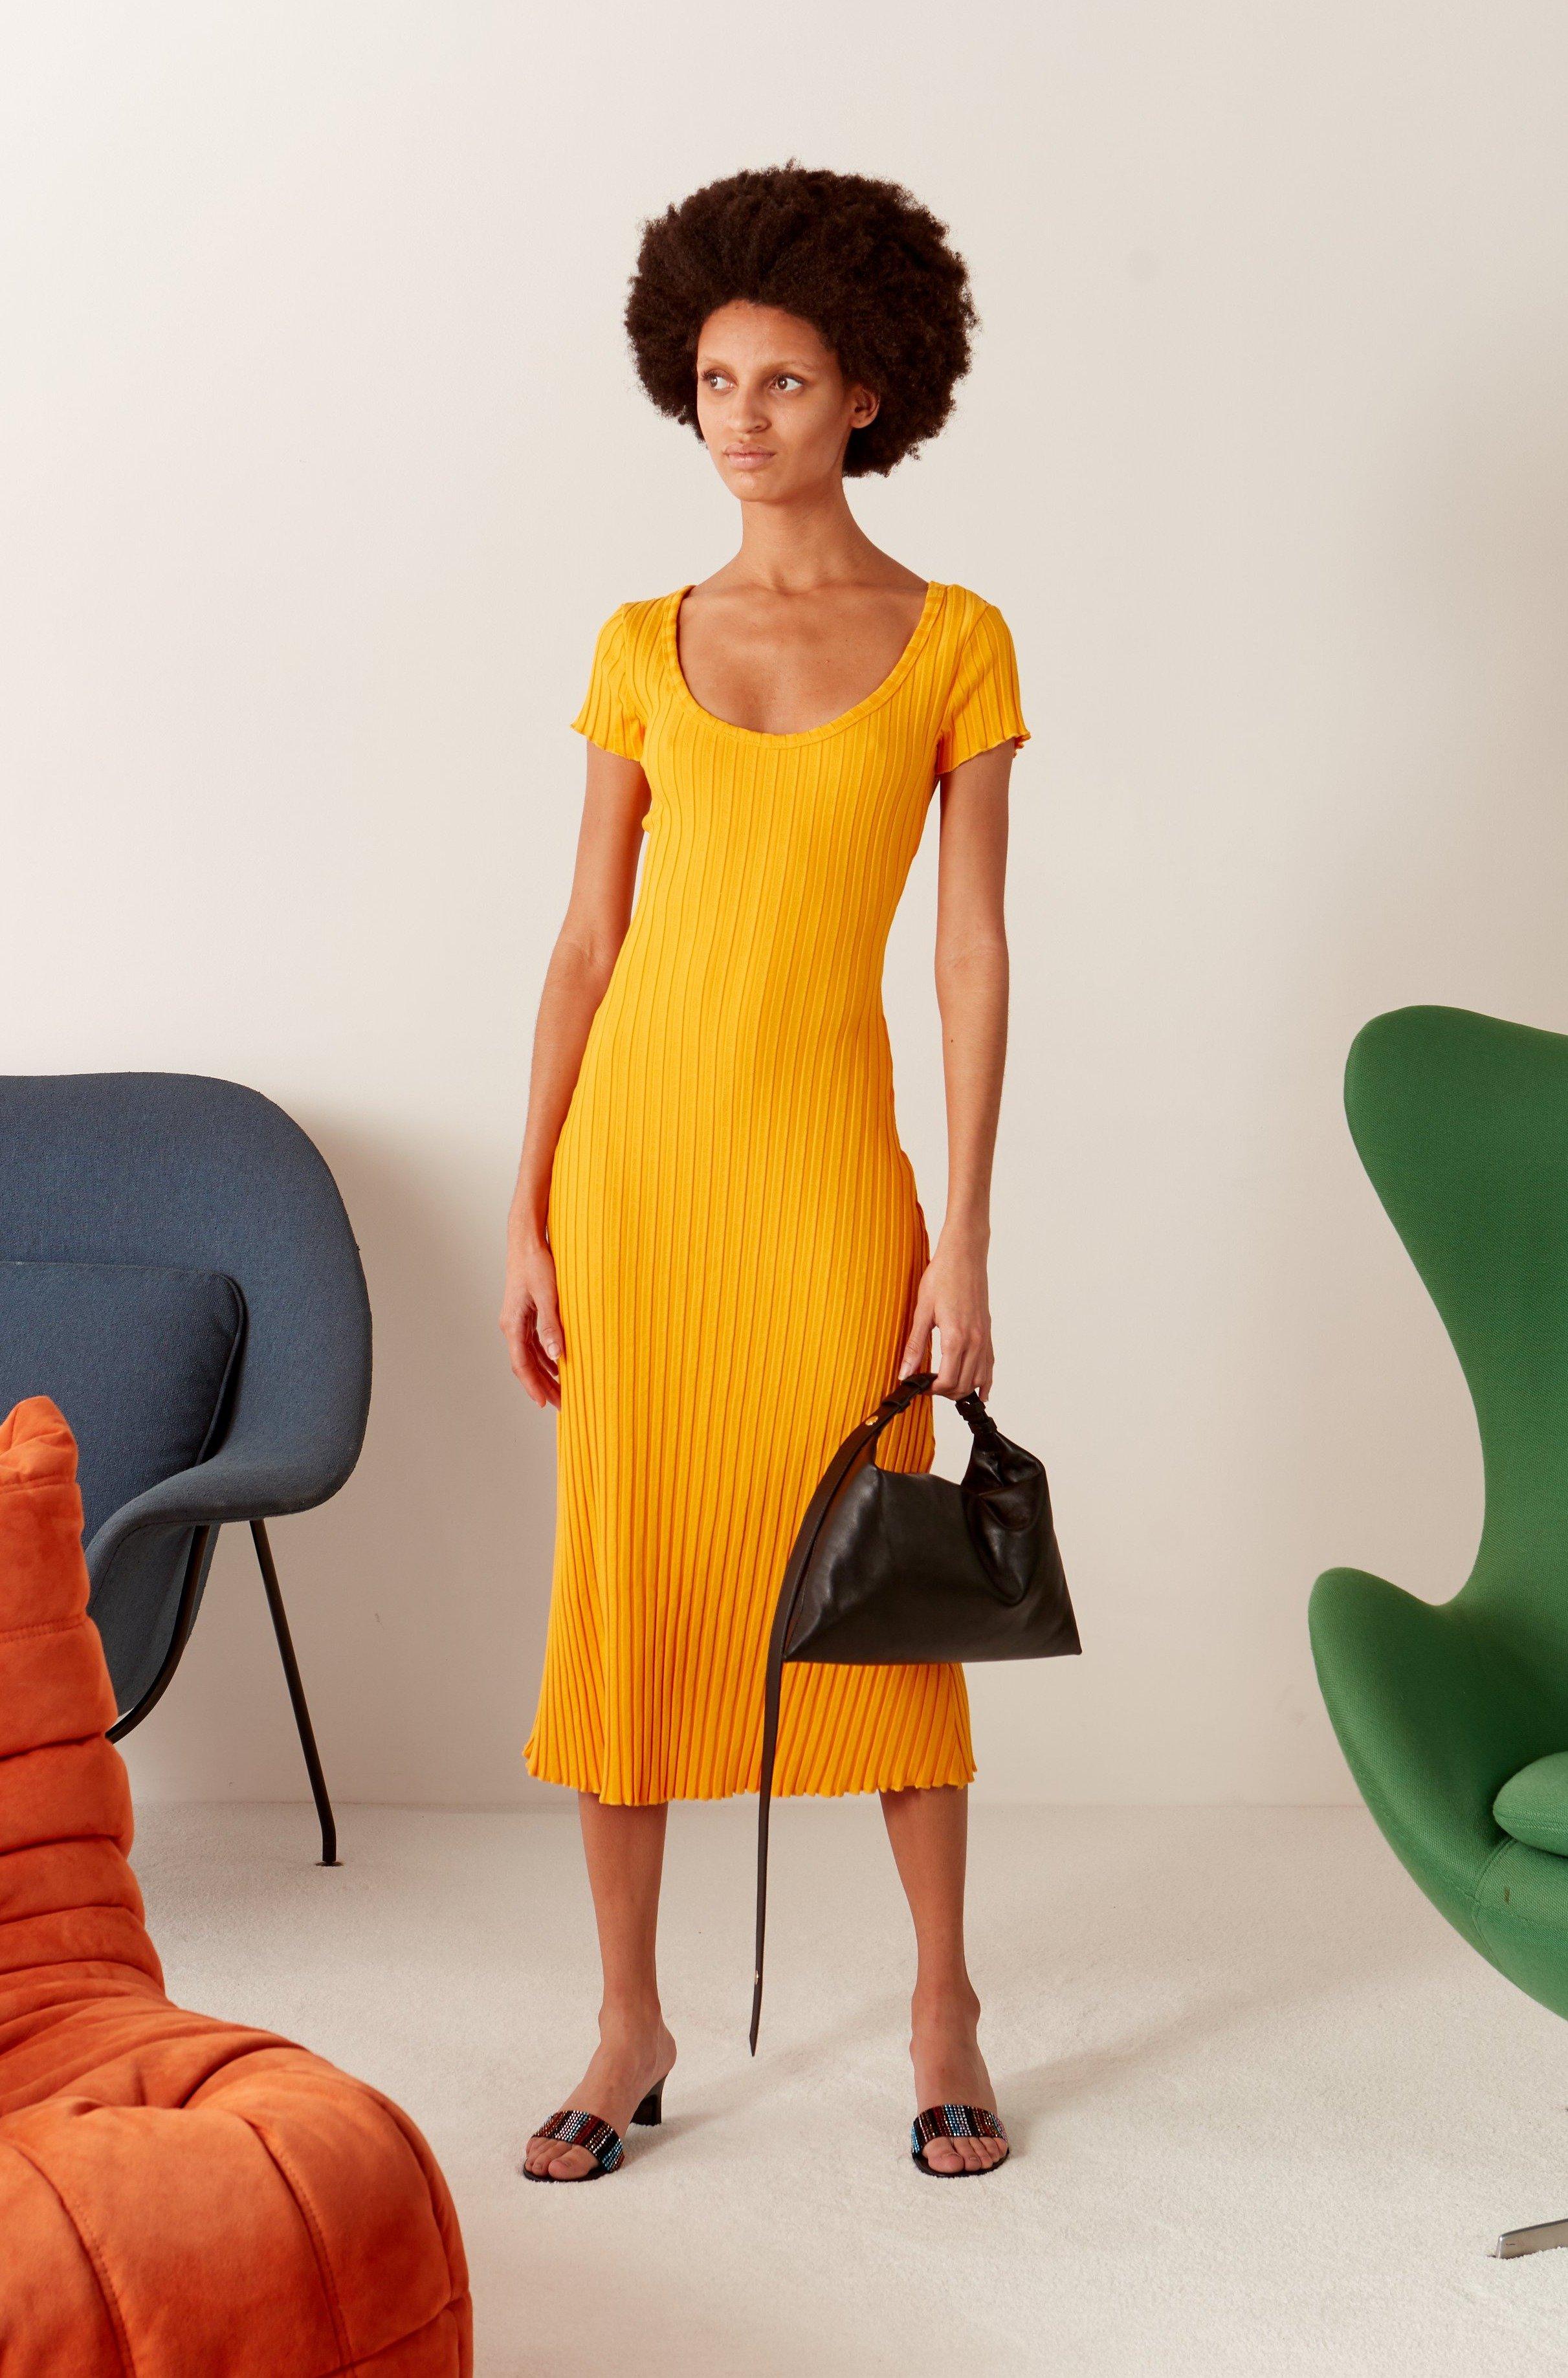 RIB Andros Dress in Sunset Orange by Simon Miller - 2